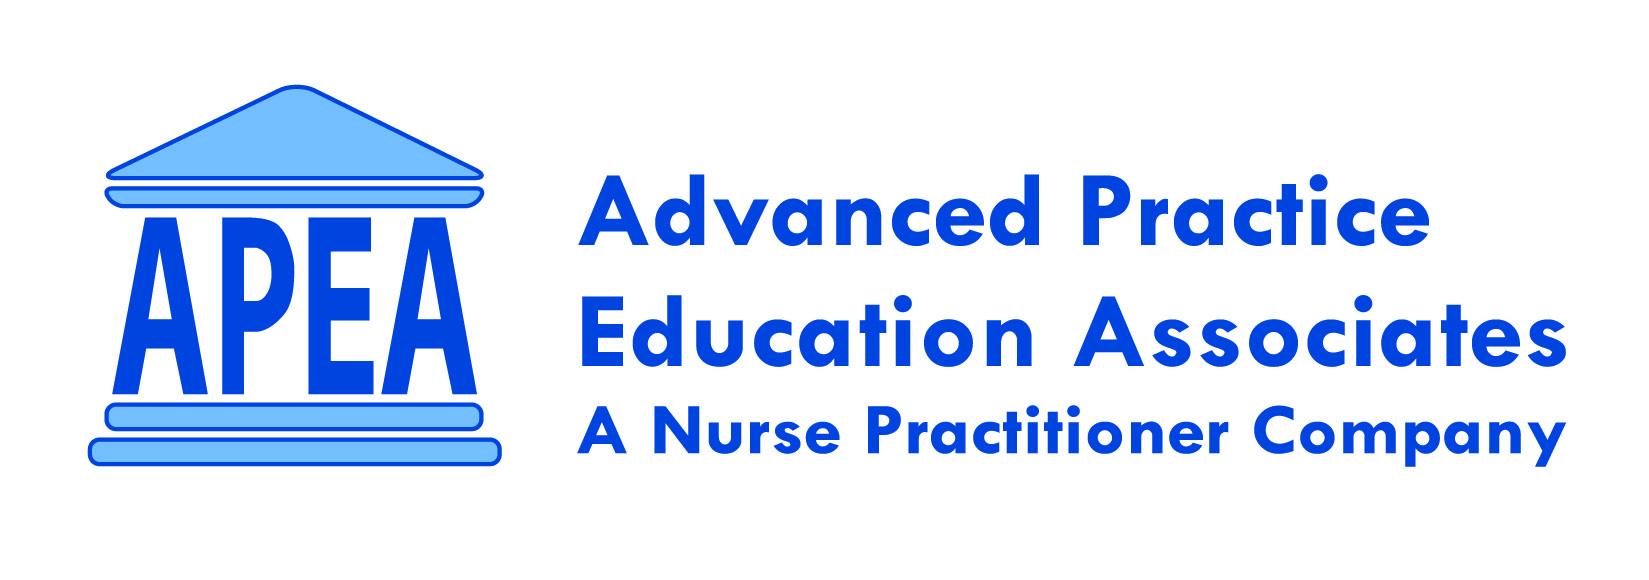 Advanced Practice Education Associates (APEA) Logo